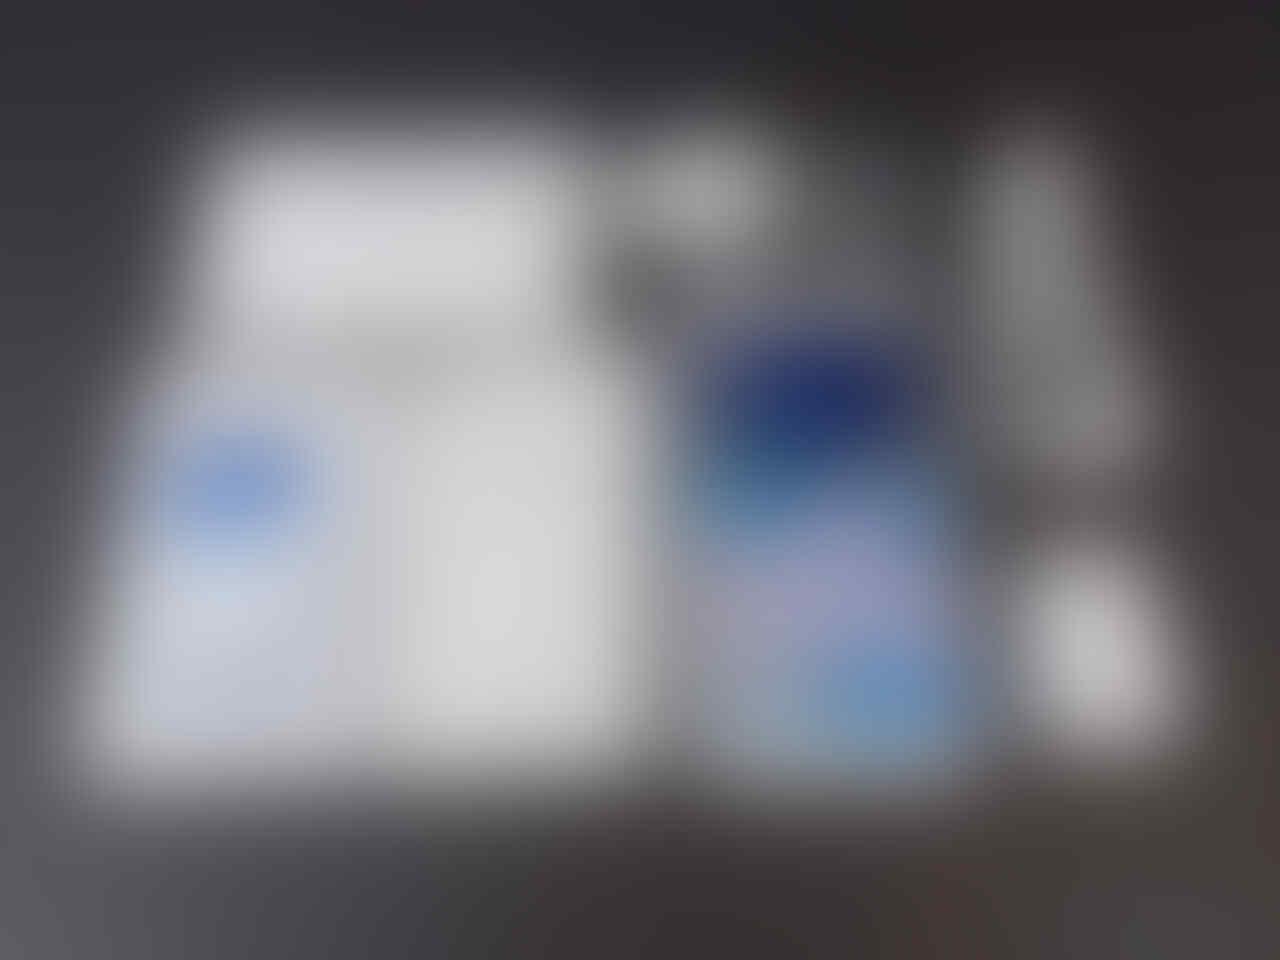 Jual Brng BM Samsung Galaxy Note 2,Galaxy S III & Gadget Lenovo K860